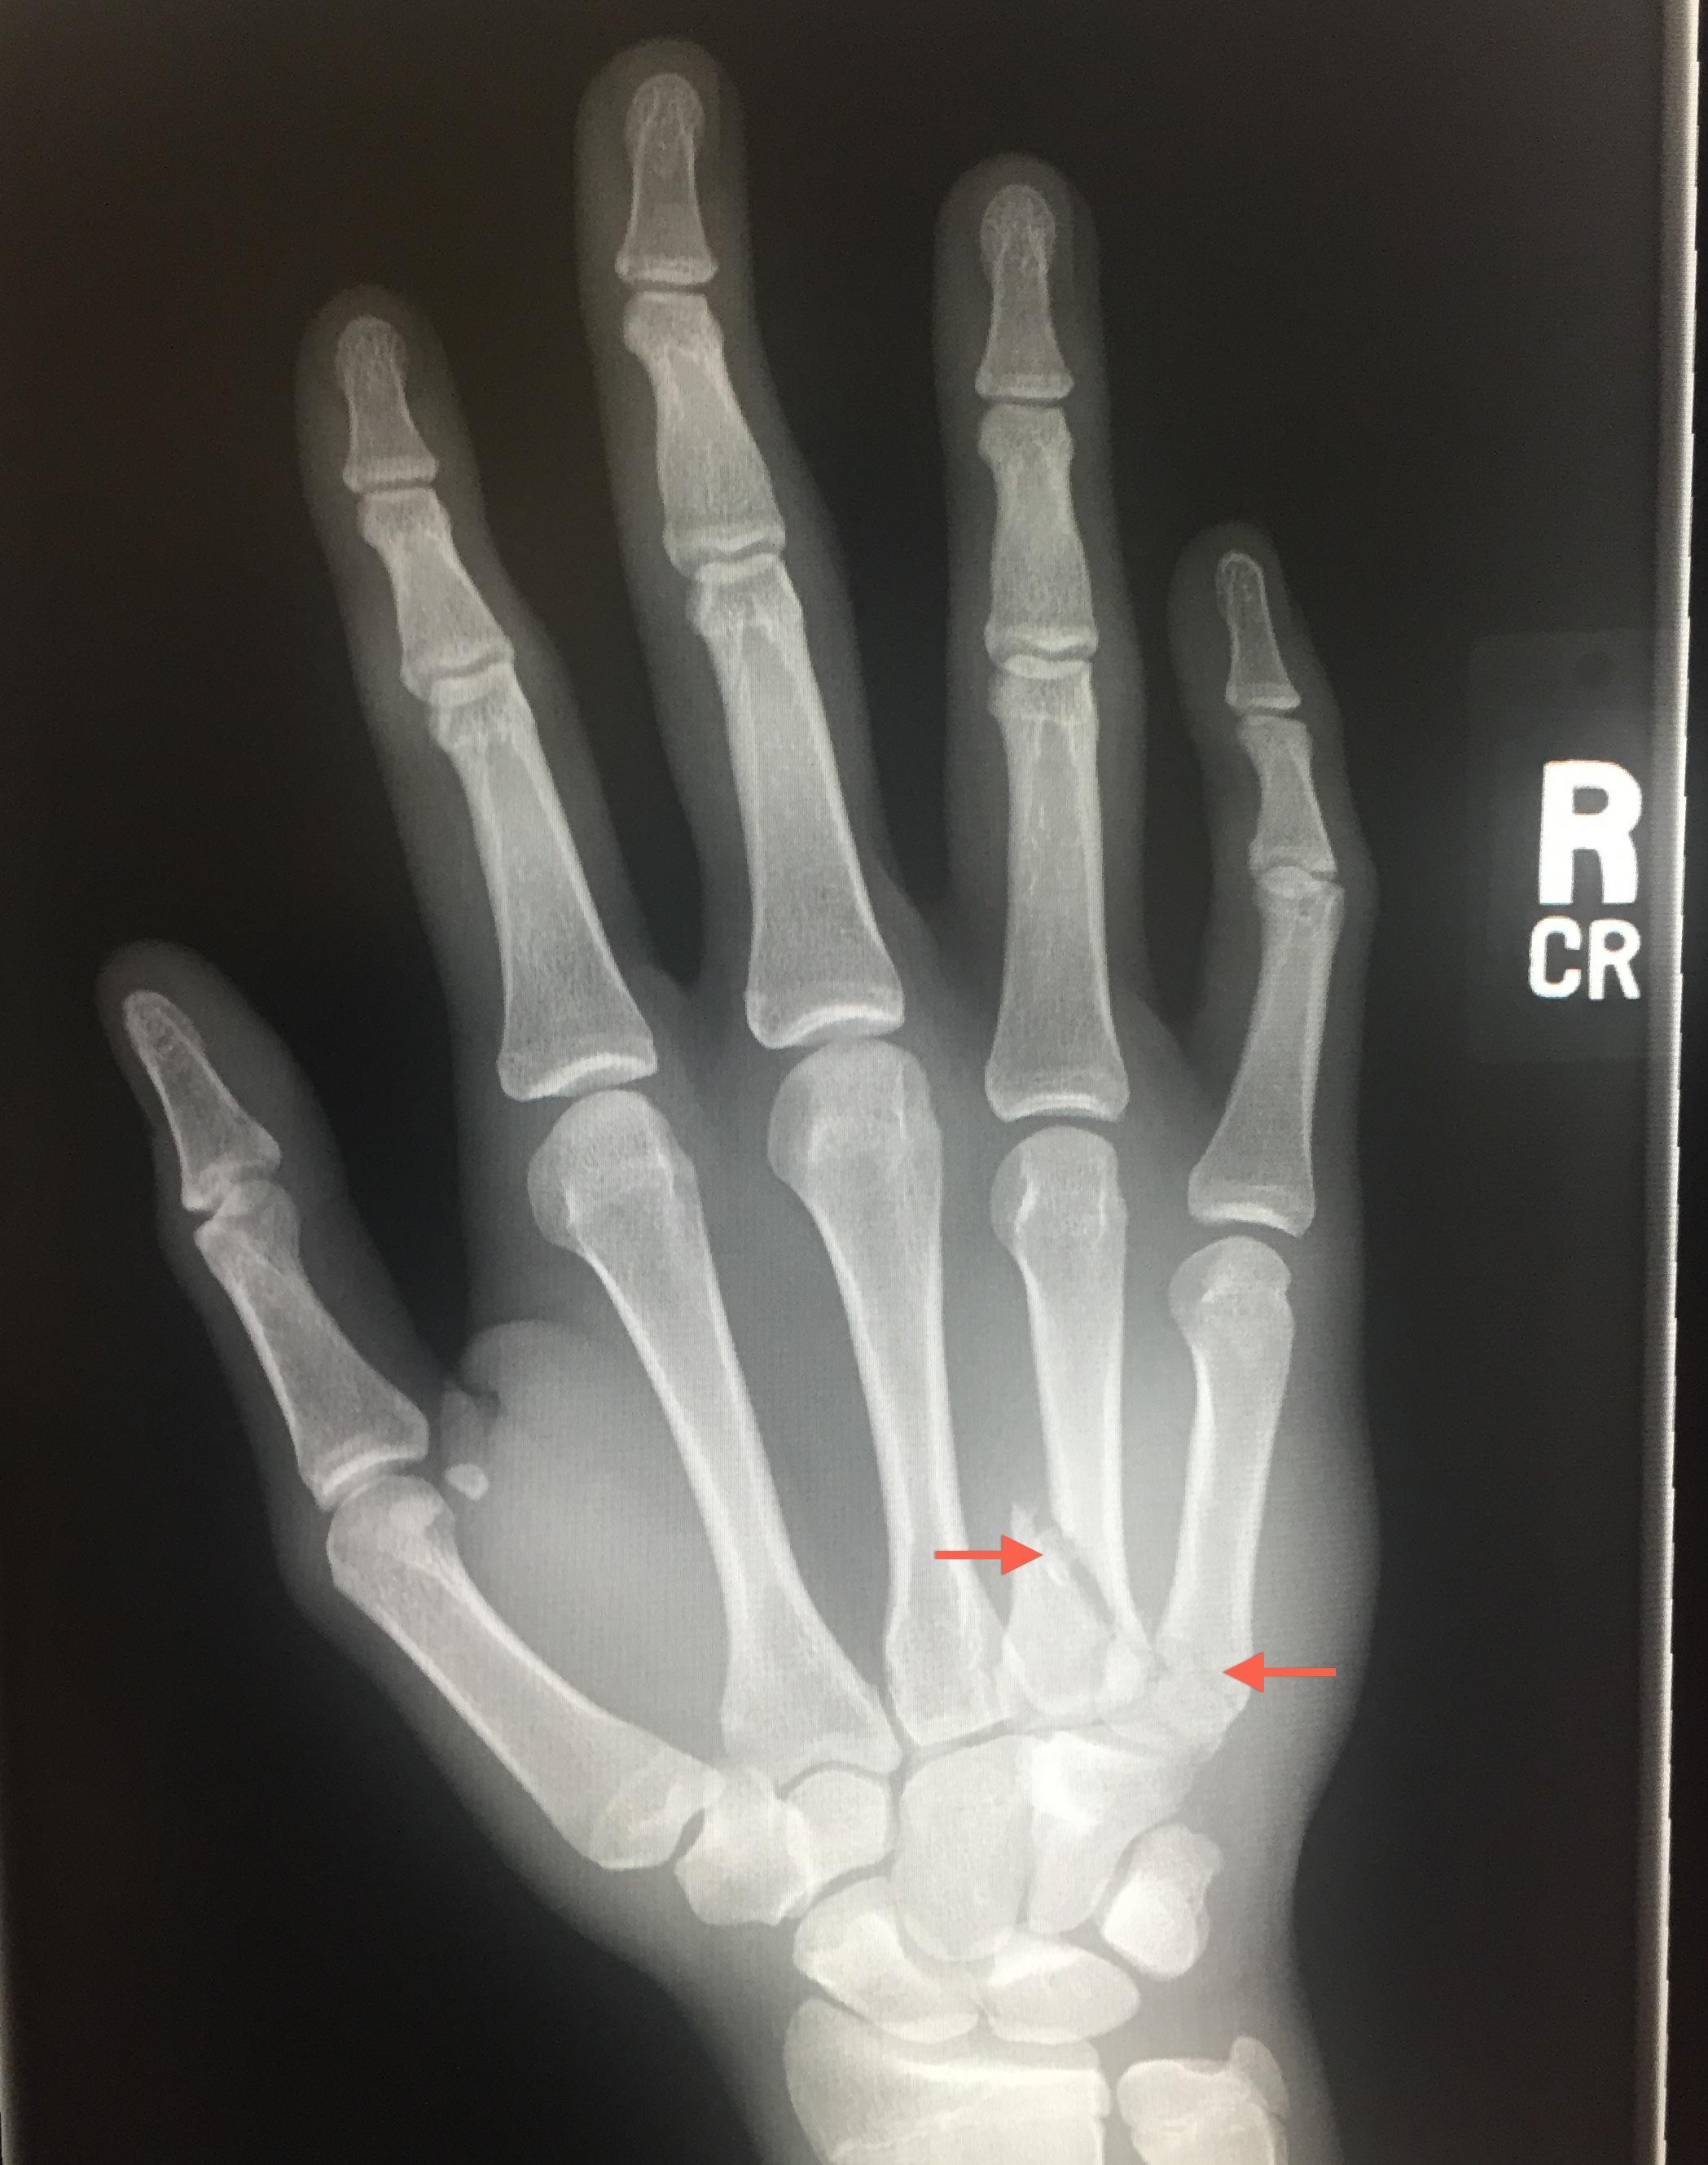 Avery's ER hand x-ray